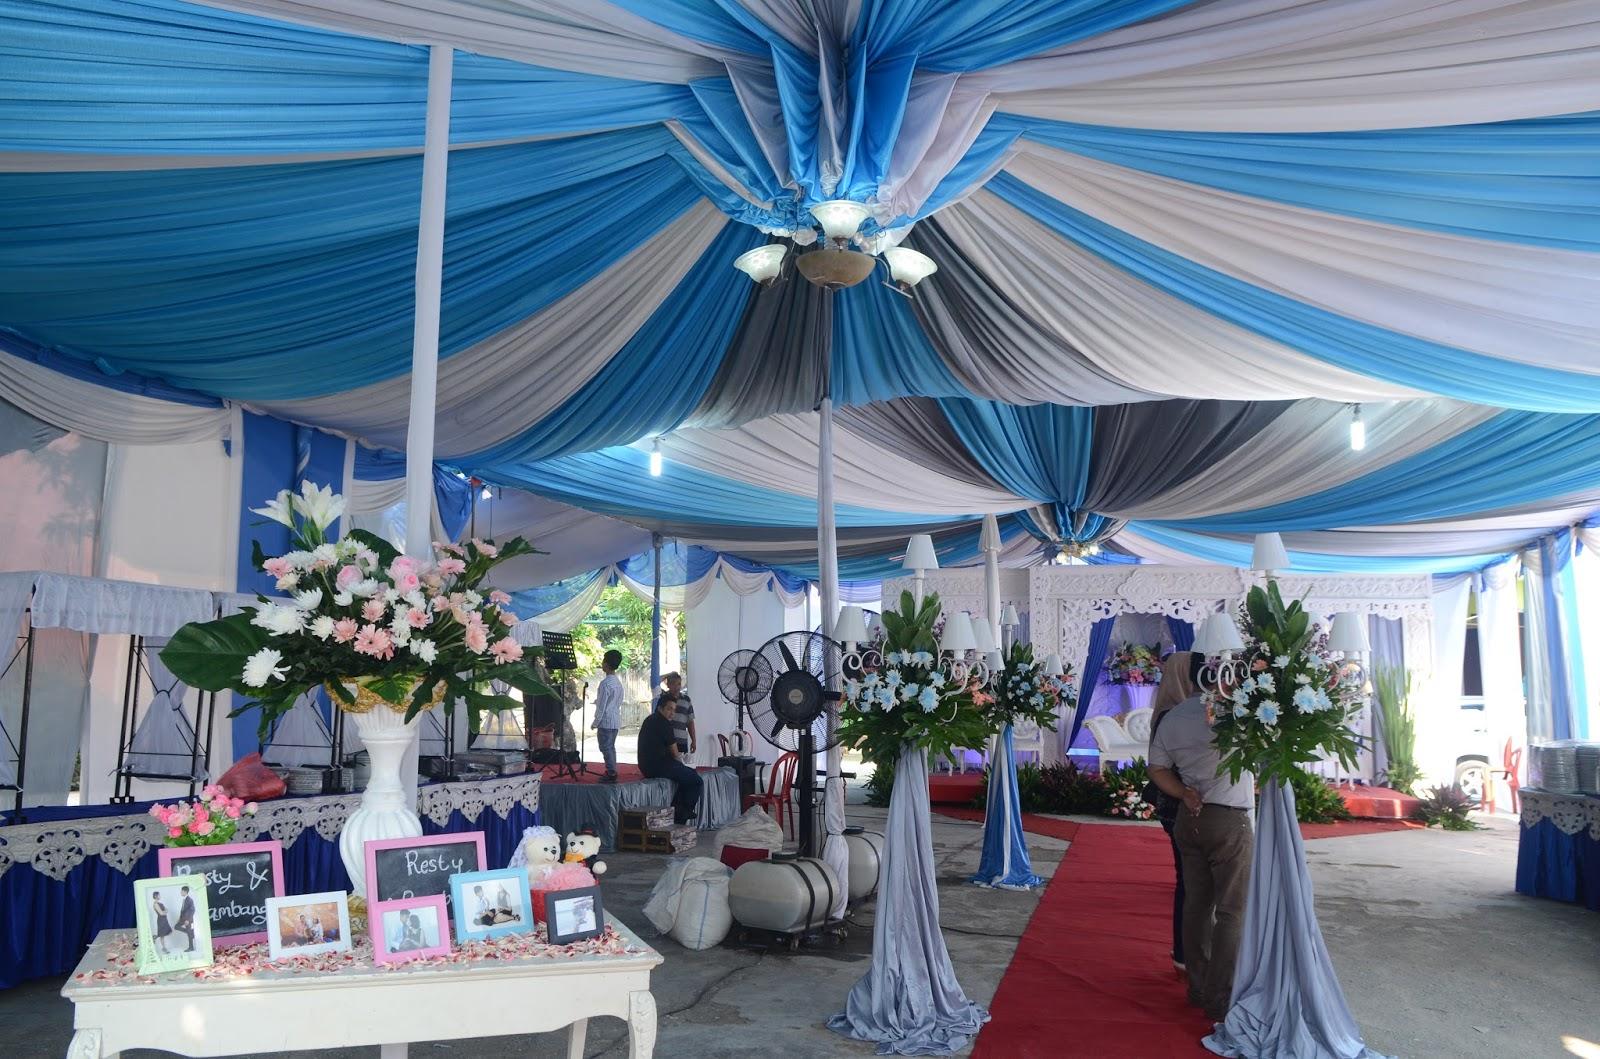 gambar dekorasi pelaminan dan tenda di